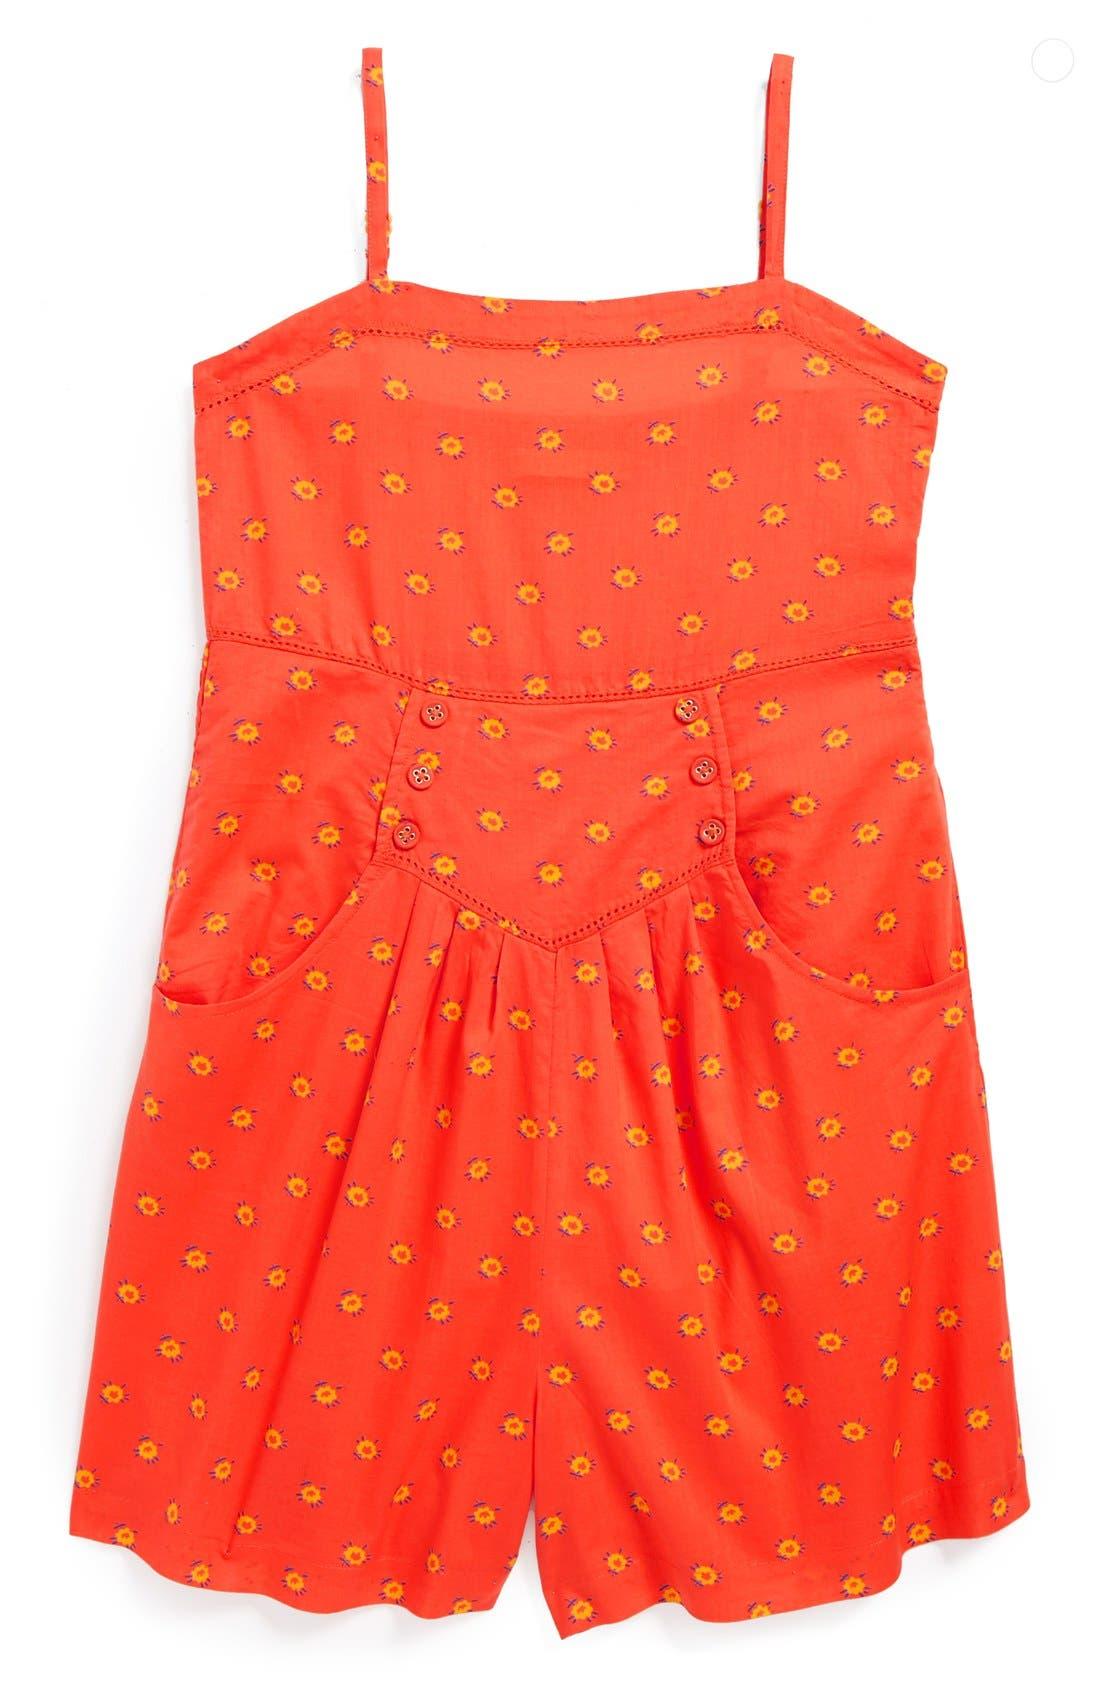 Alternate Image 1 Selected - Stella McCartney Floral Print Cotton Romper (Toddler Girls, Little Girls & Big Girls)